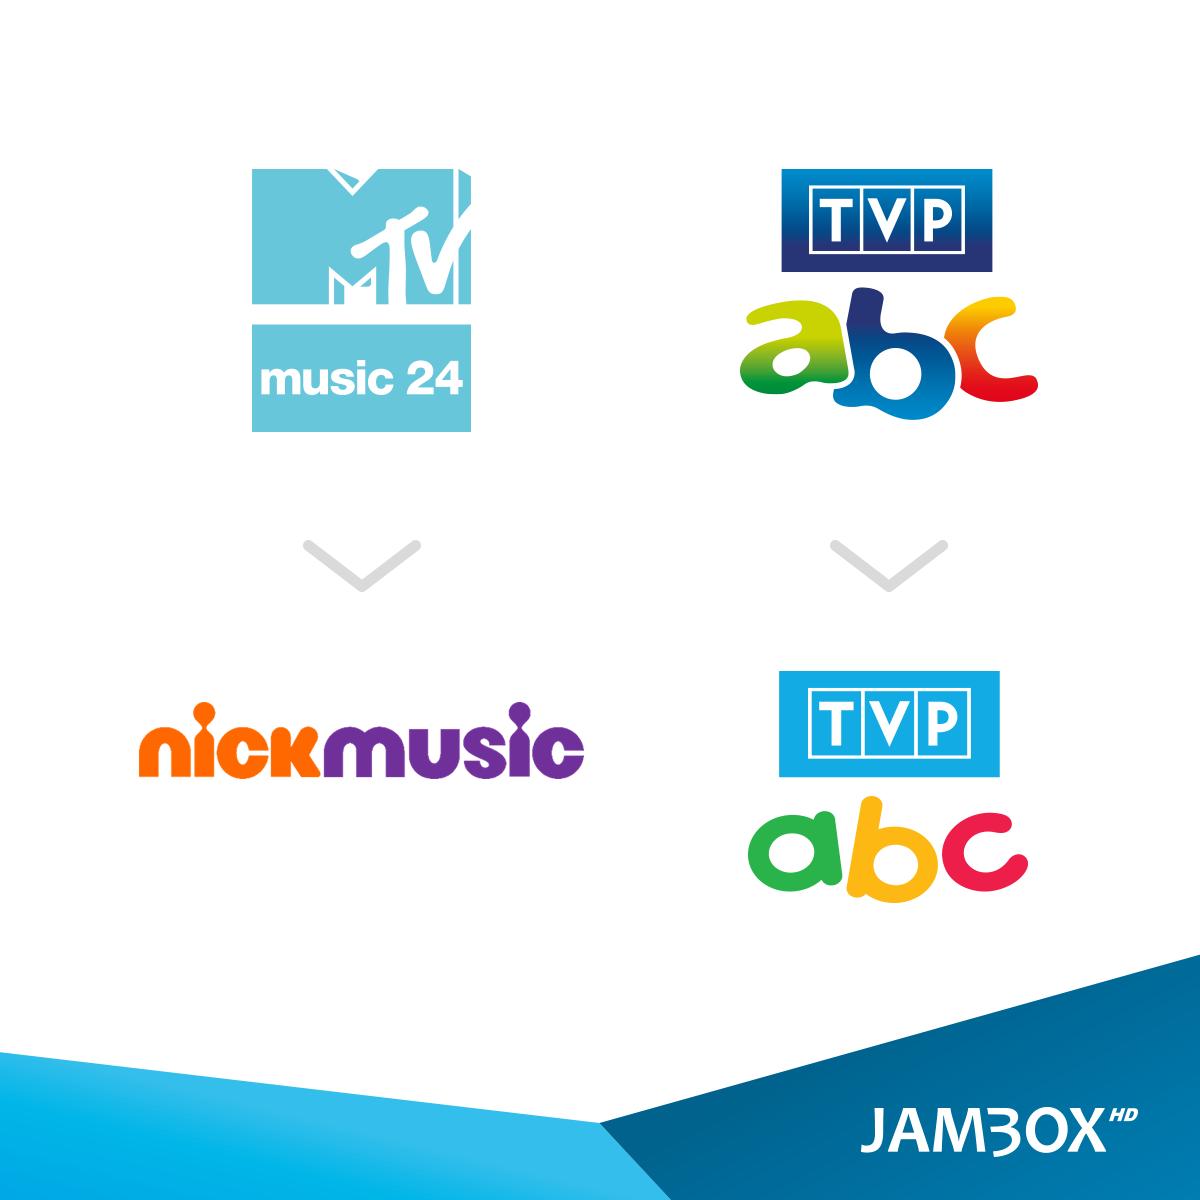 NickMusic i TVP ABC